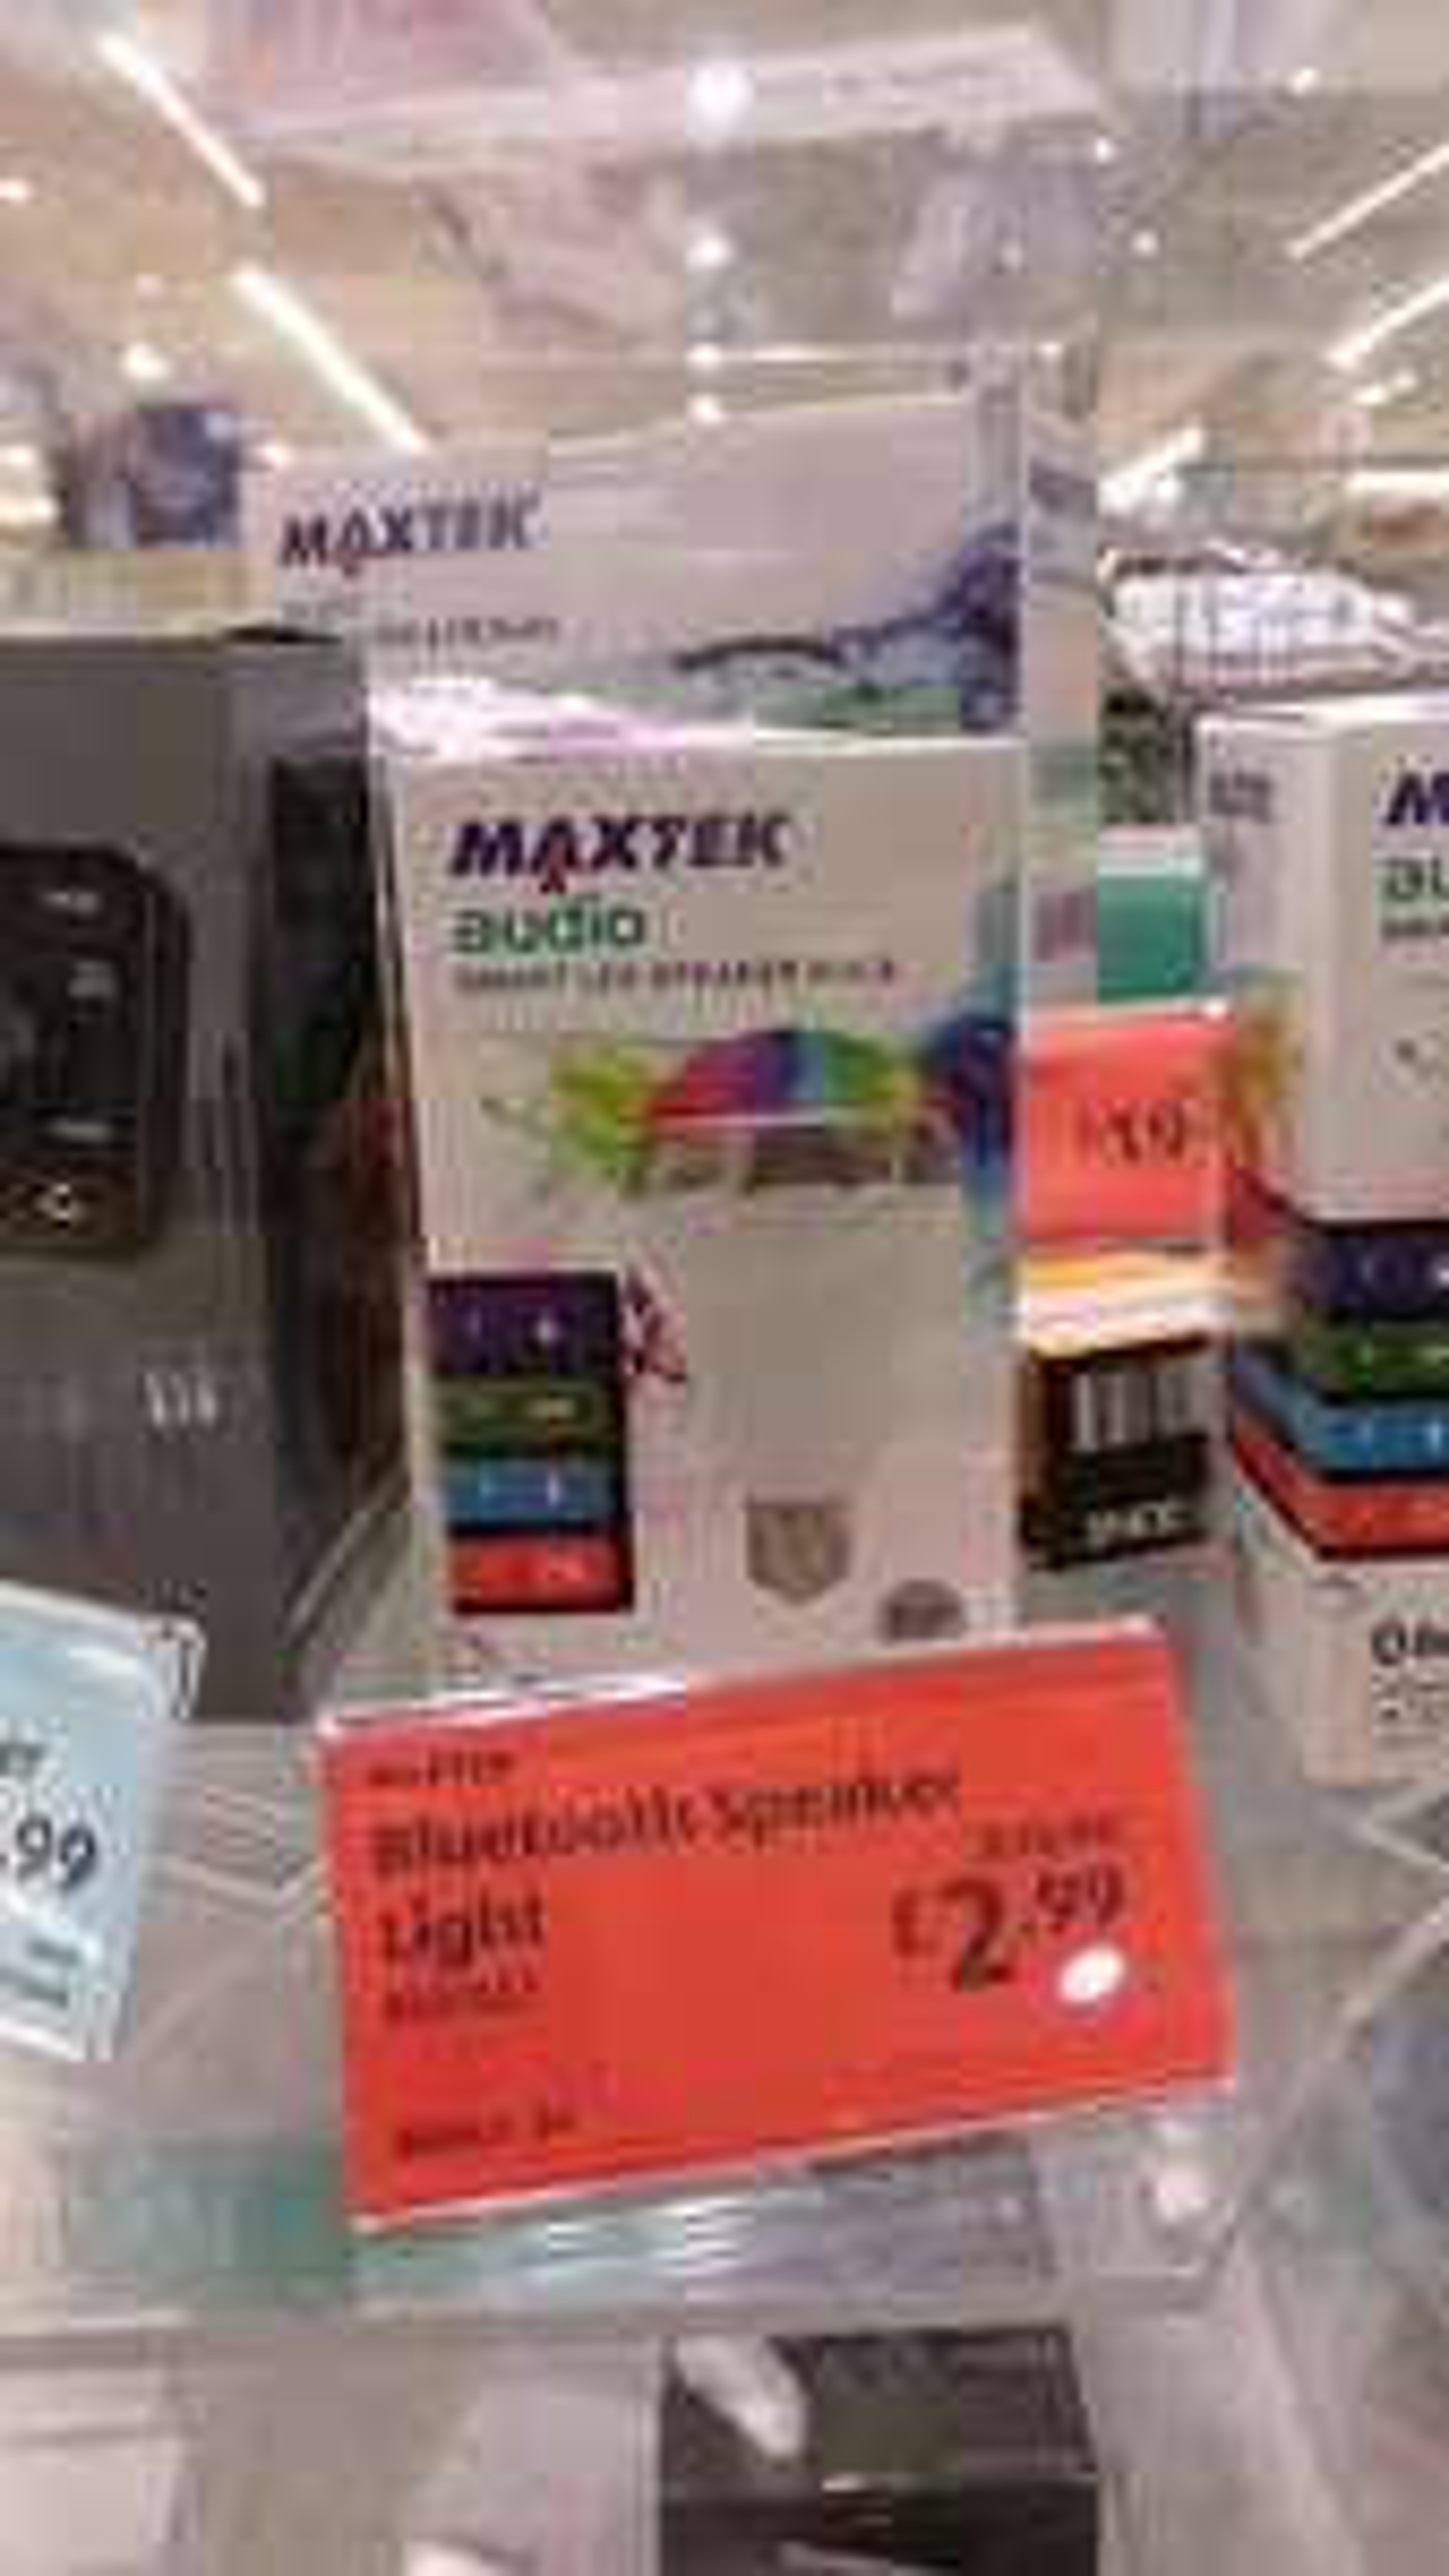 MAXTEK audio bluetooth LED bulb and speaker - £2.99 @ Aldi